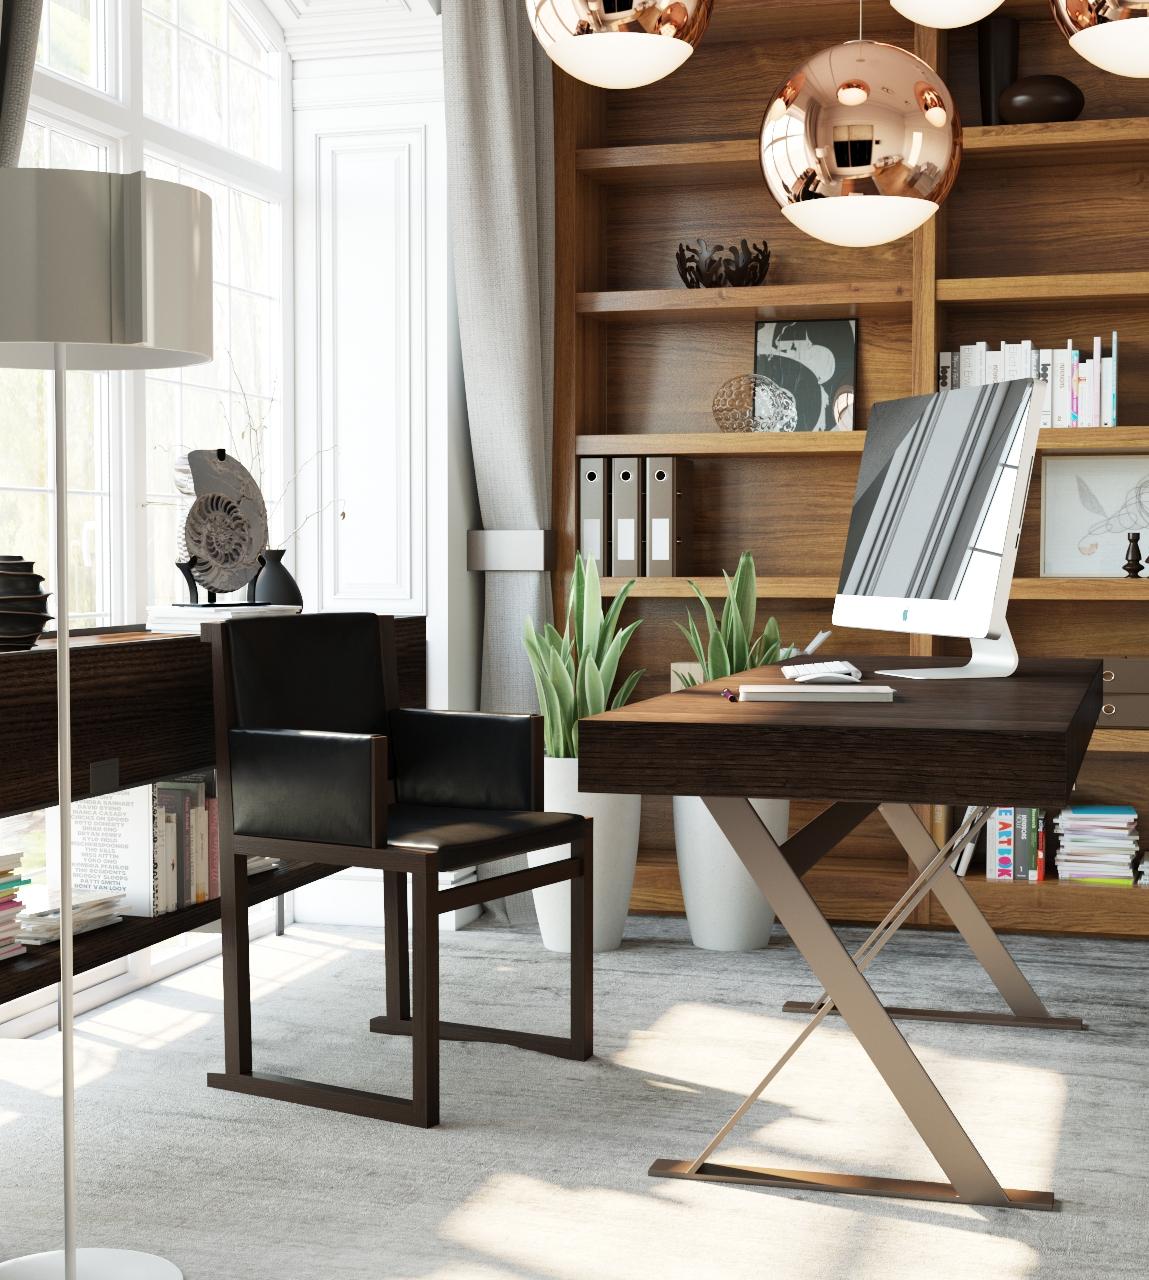 18 Drafting Tables In Interior Designs: Interior Design Ideas